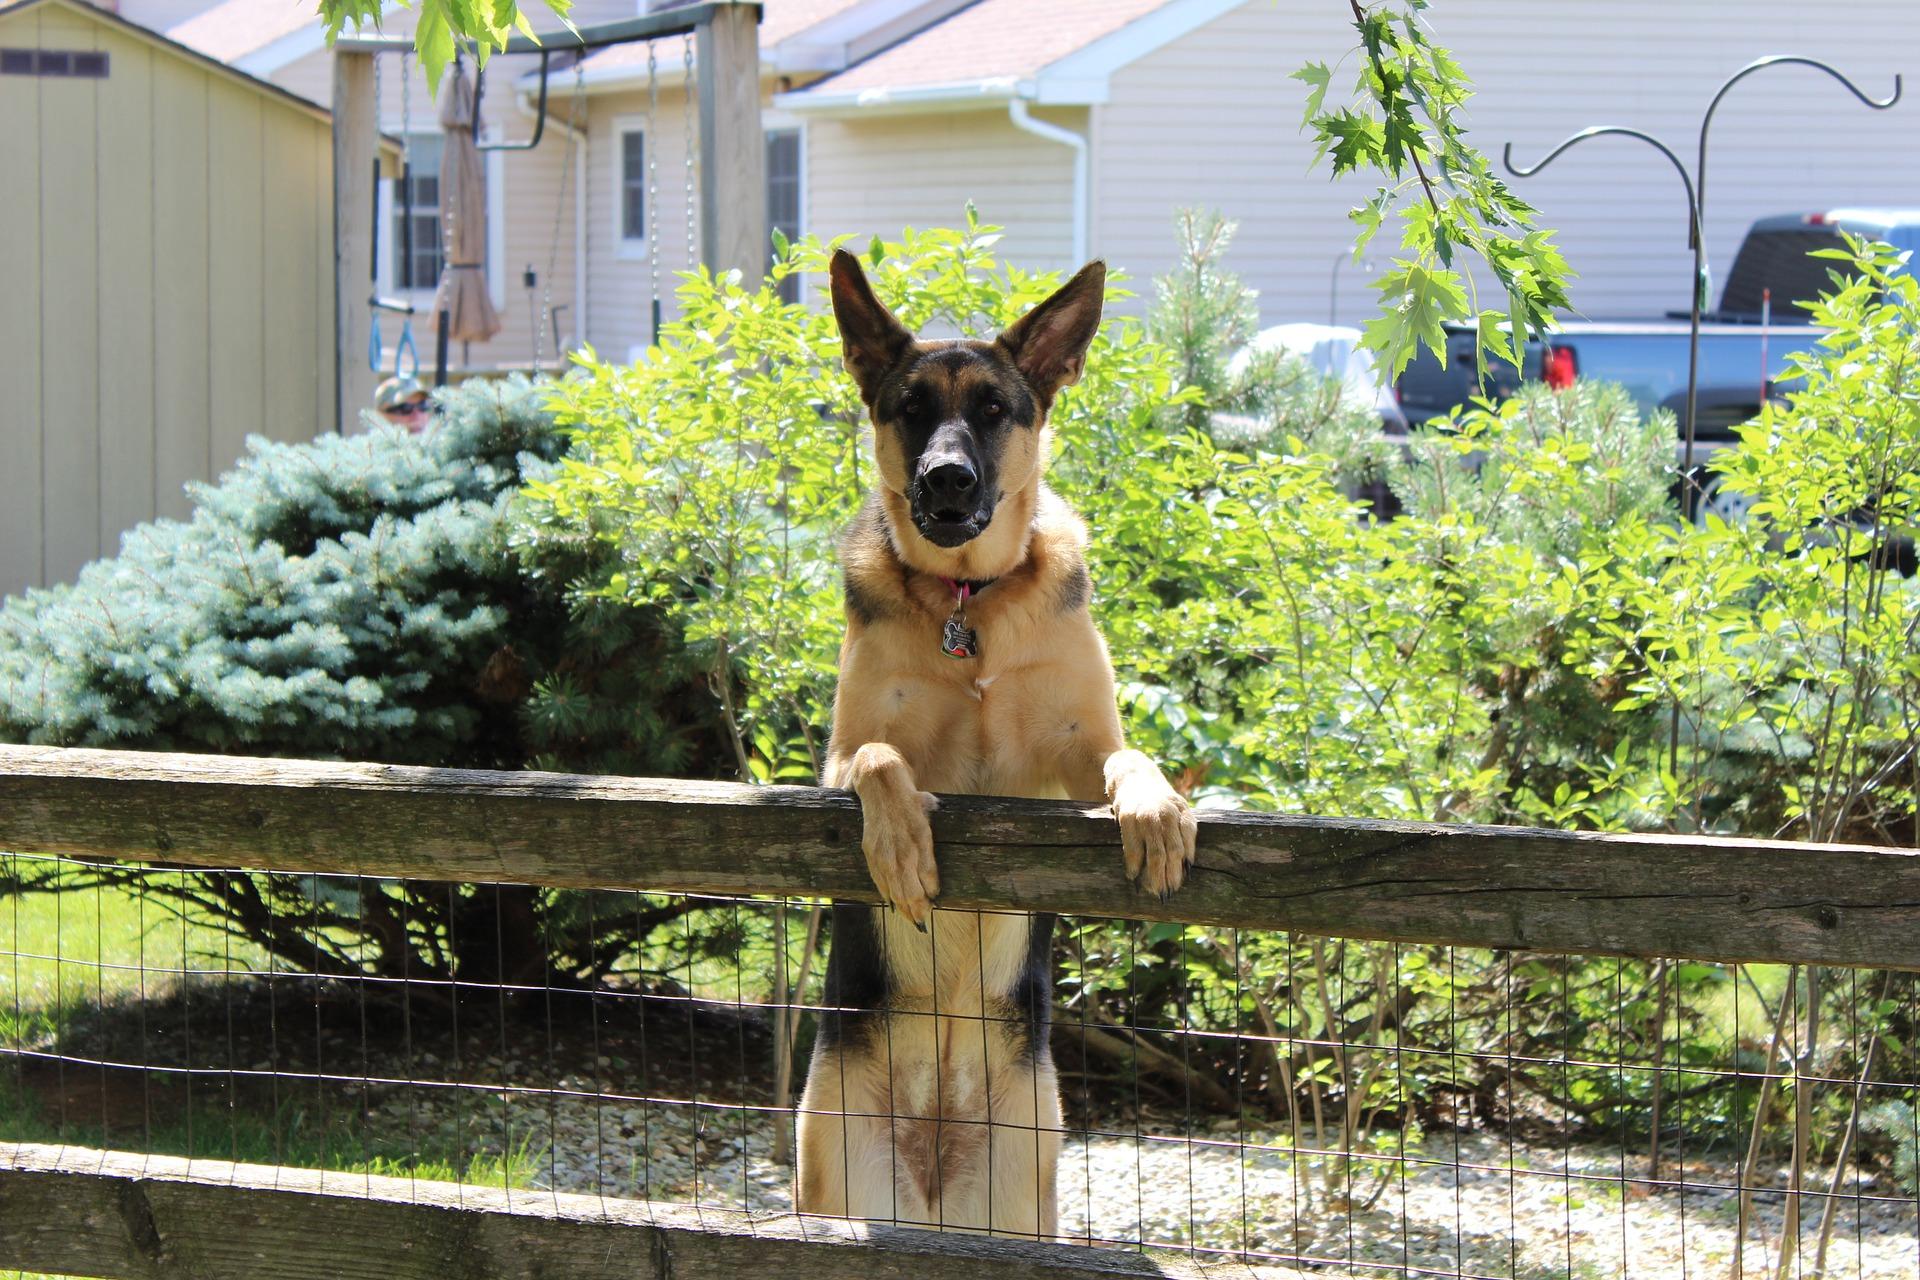 Installer une clôture pour chien | Gamm vert